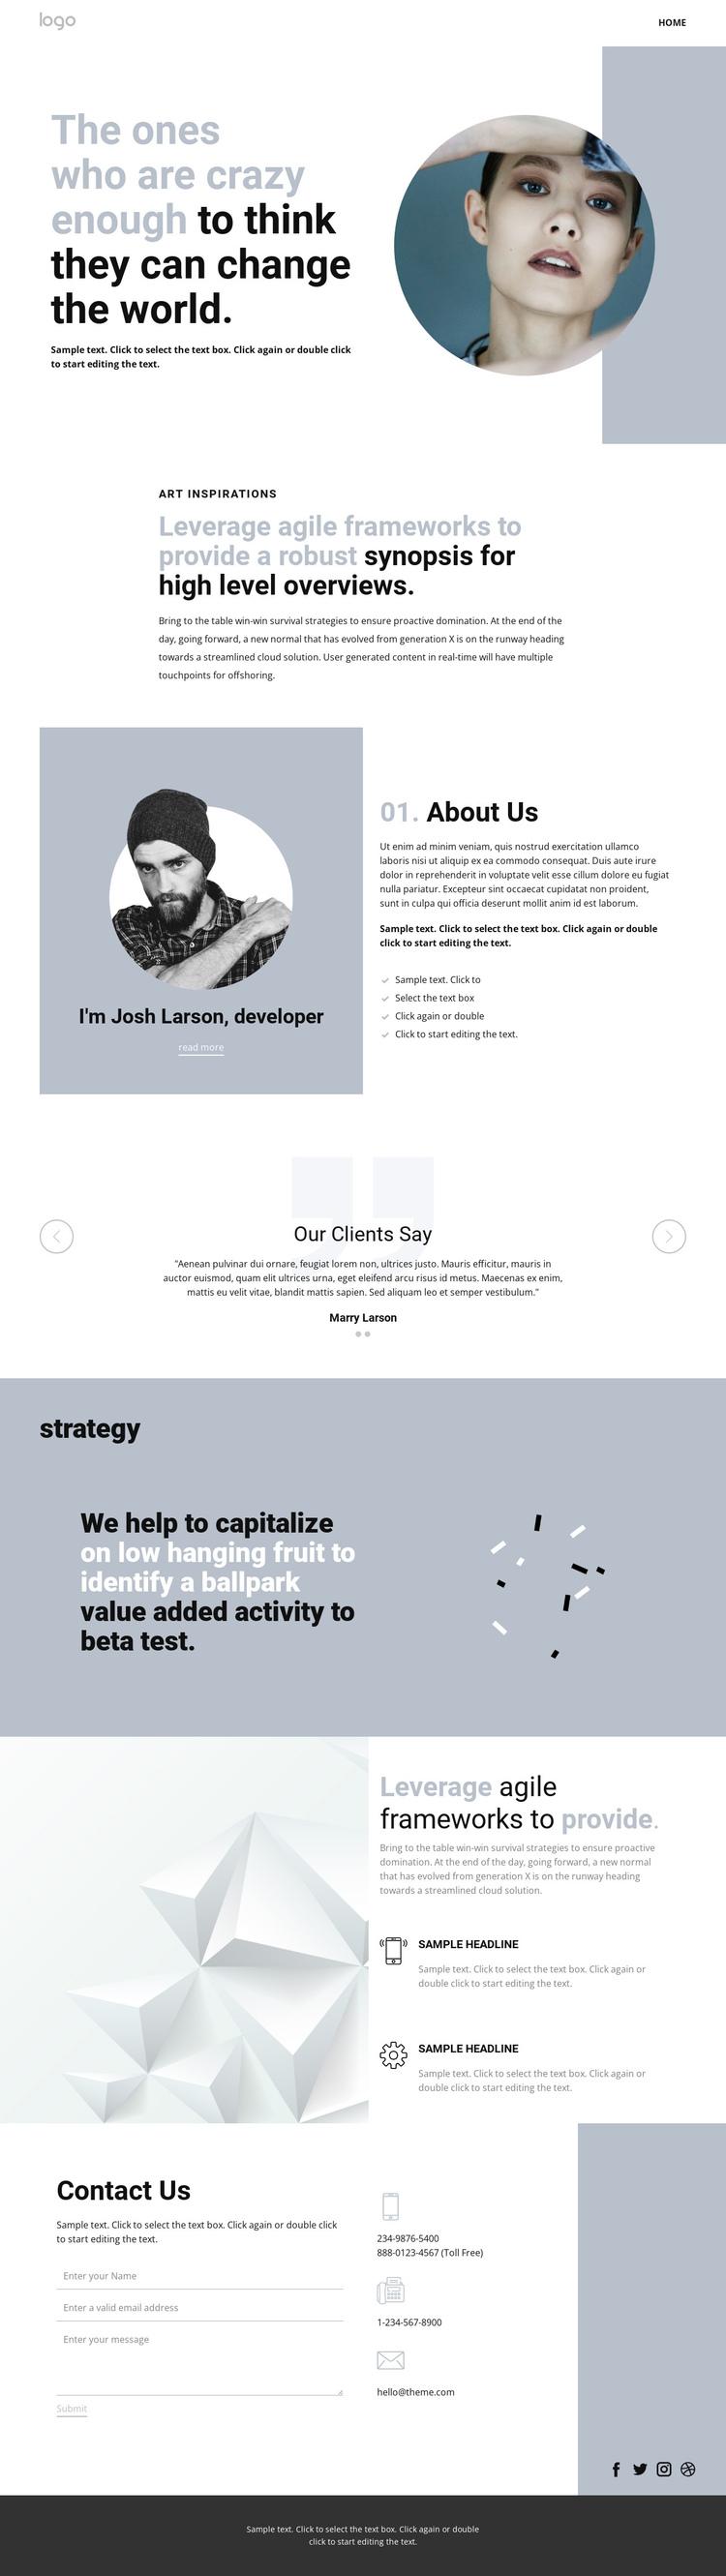 Creative studio innovation art One Page Template